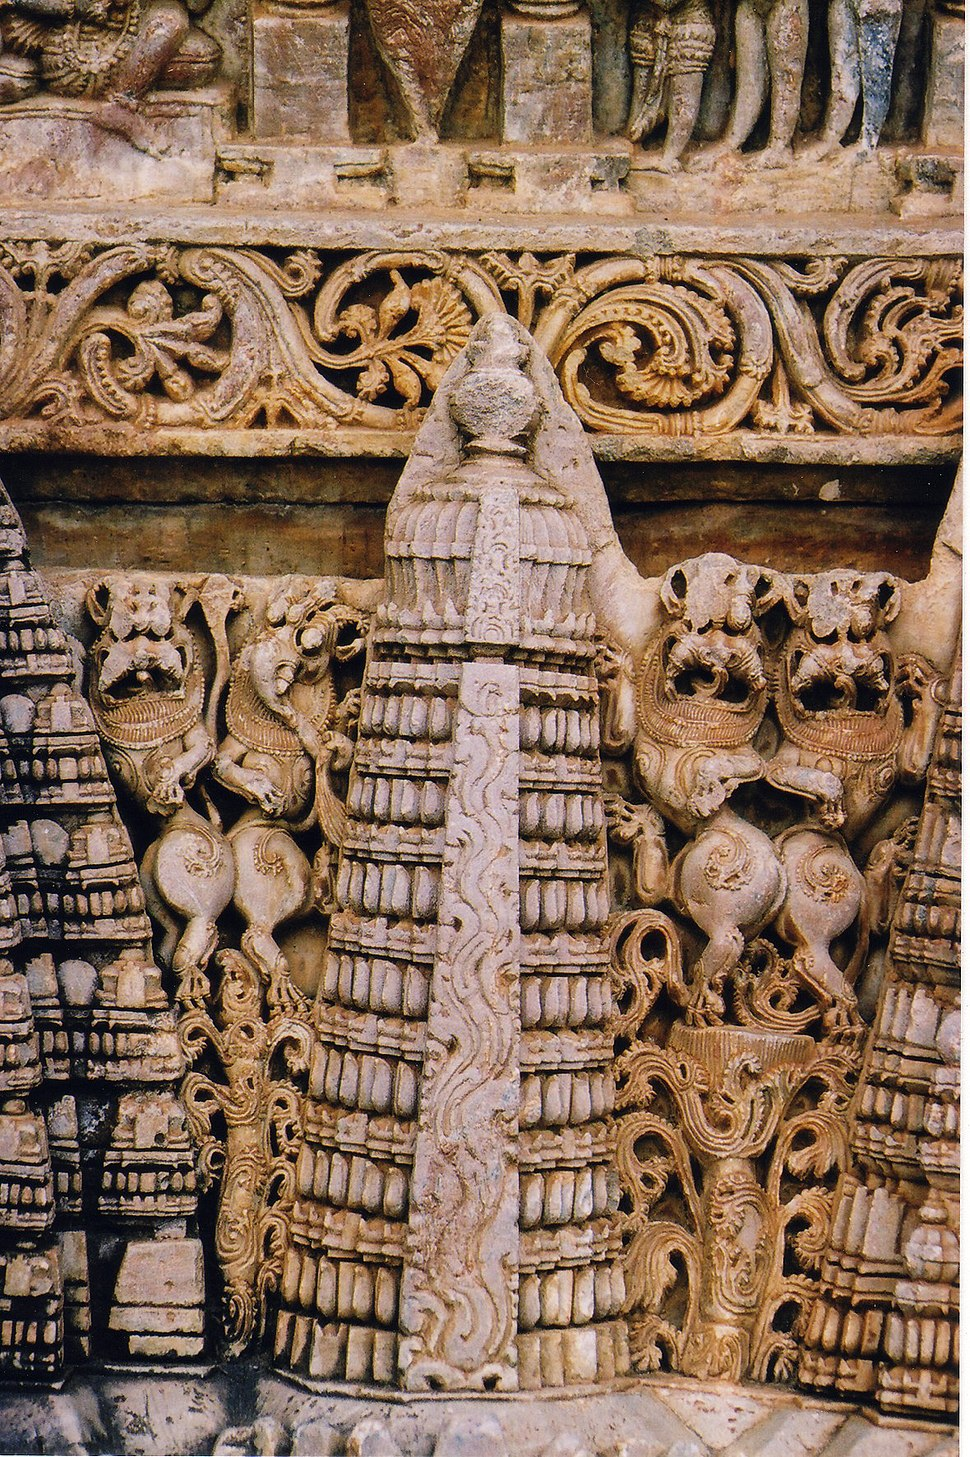 Wall Sculpture at Amrutesvara Temple in Chikkamagaluru district